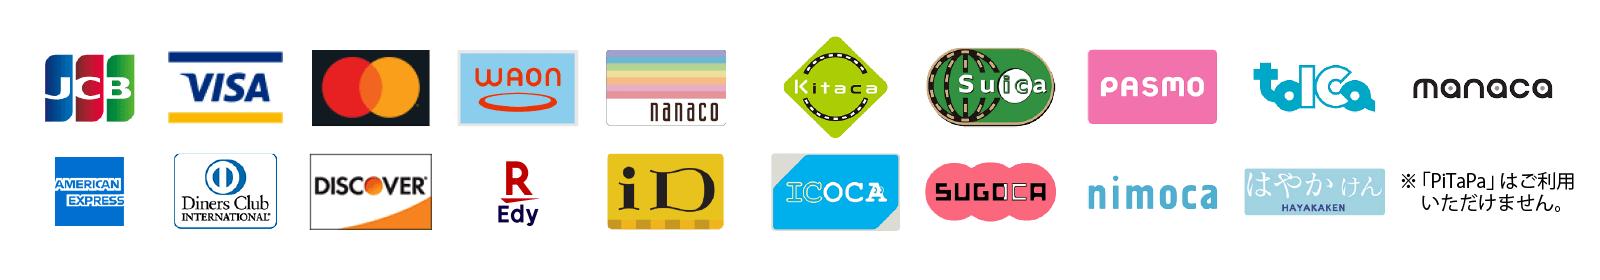 creditcard_logo